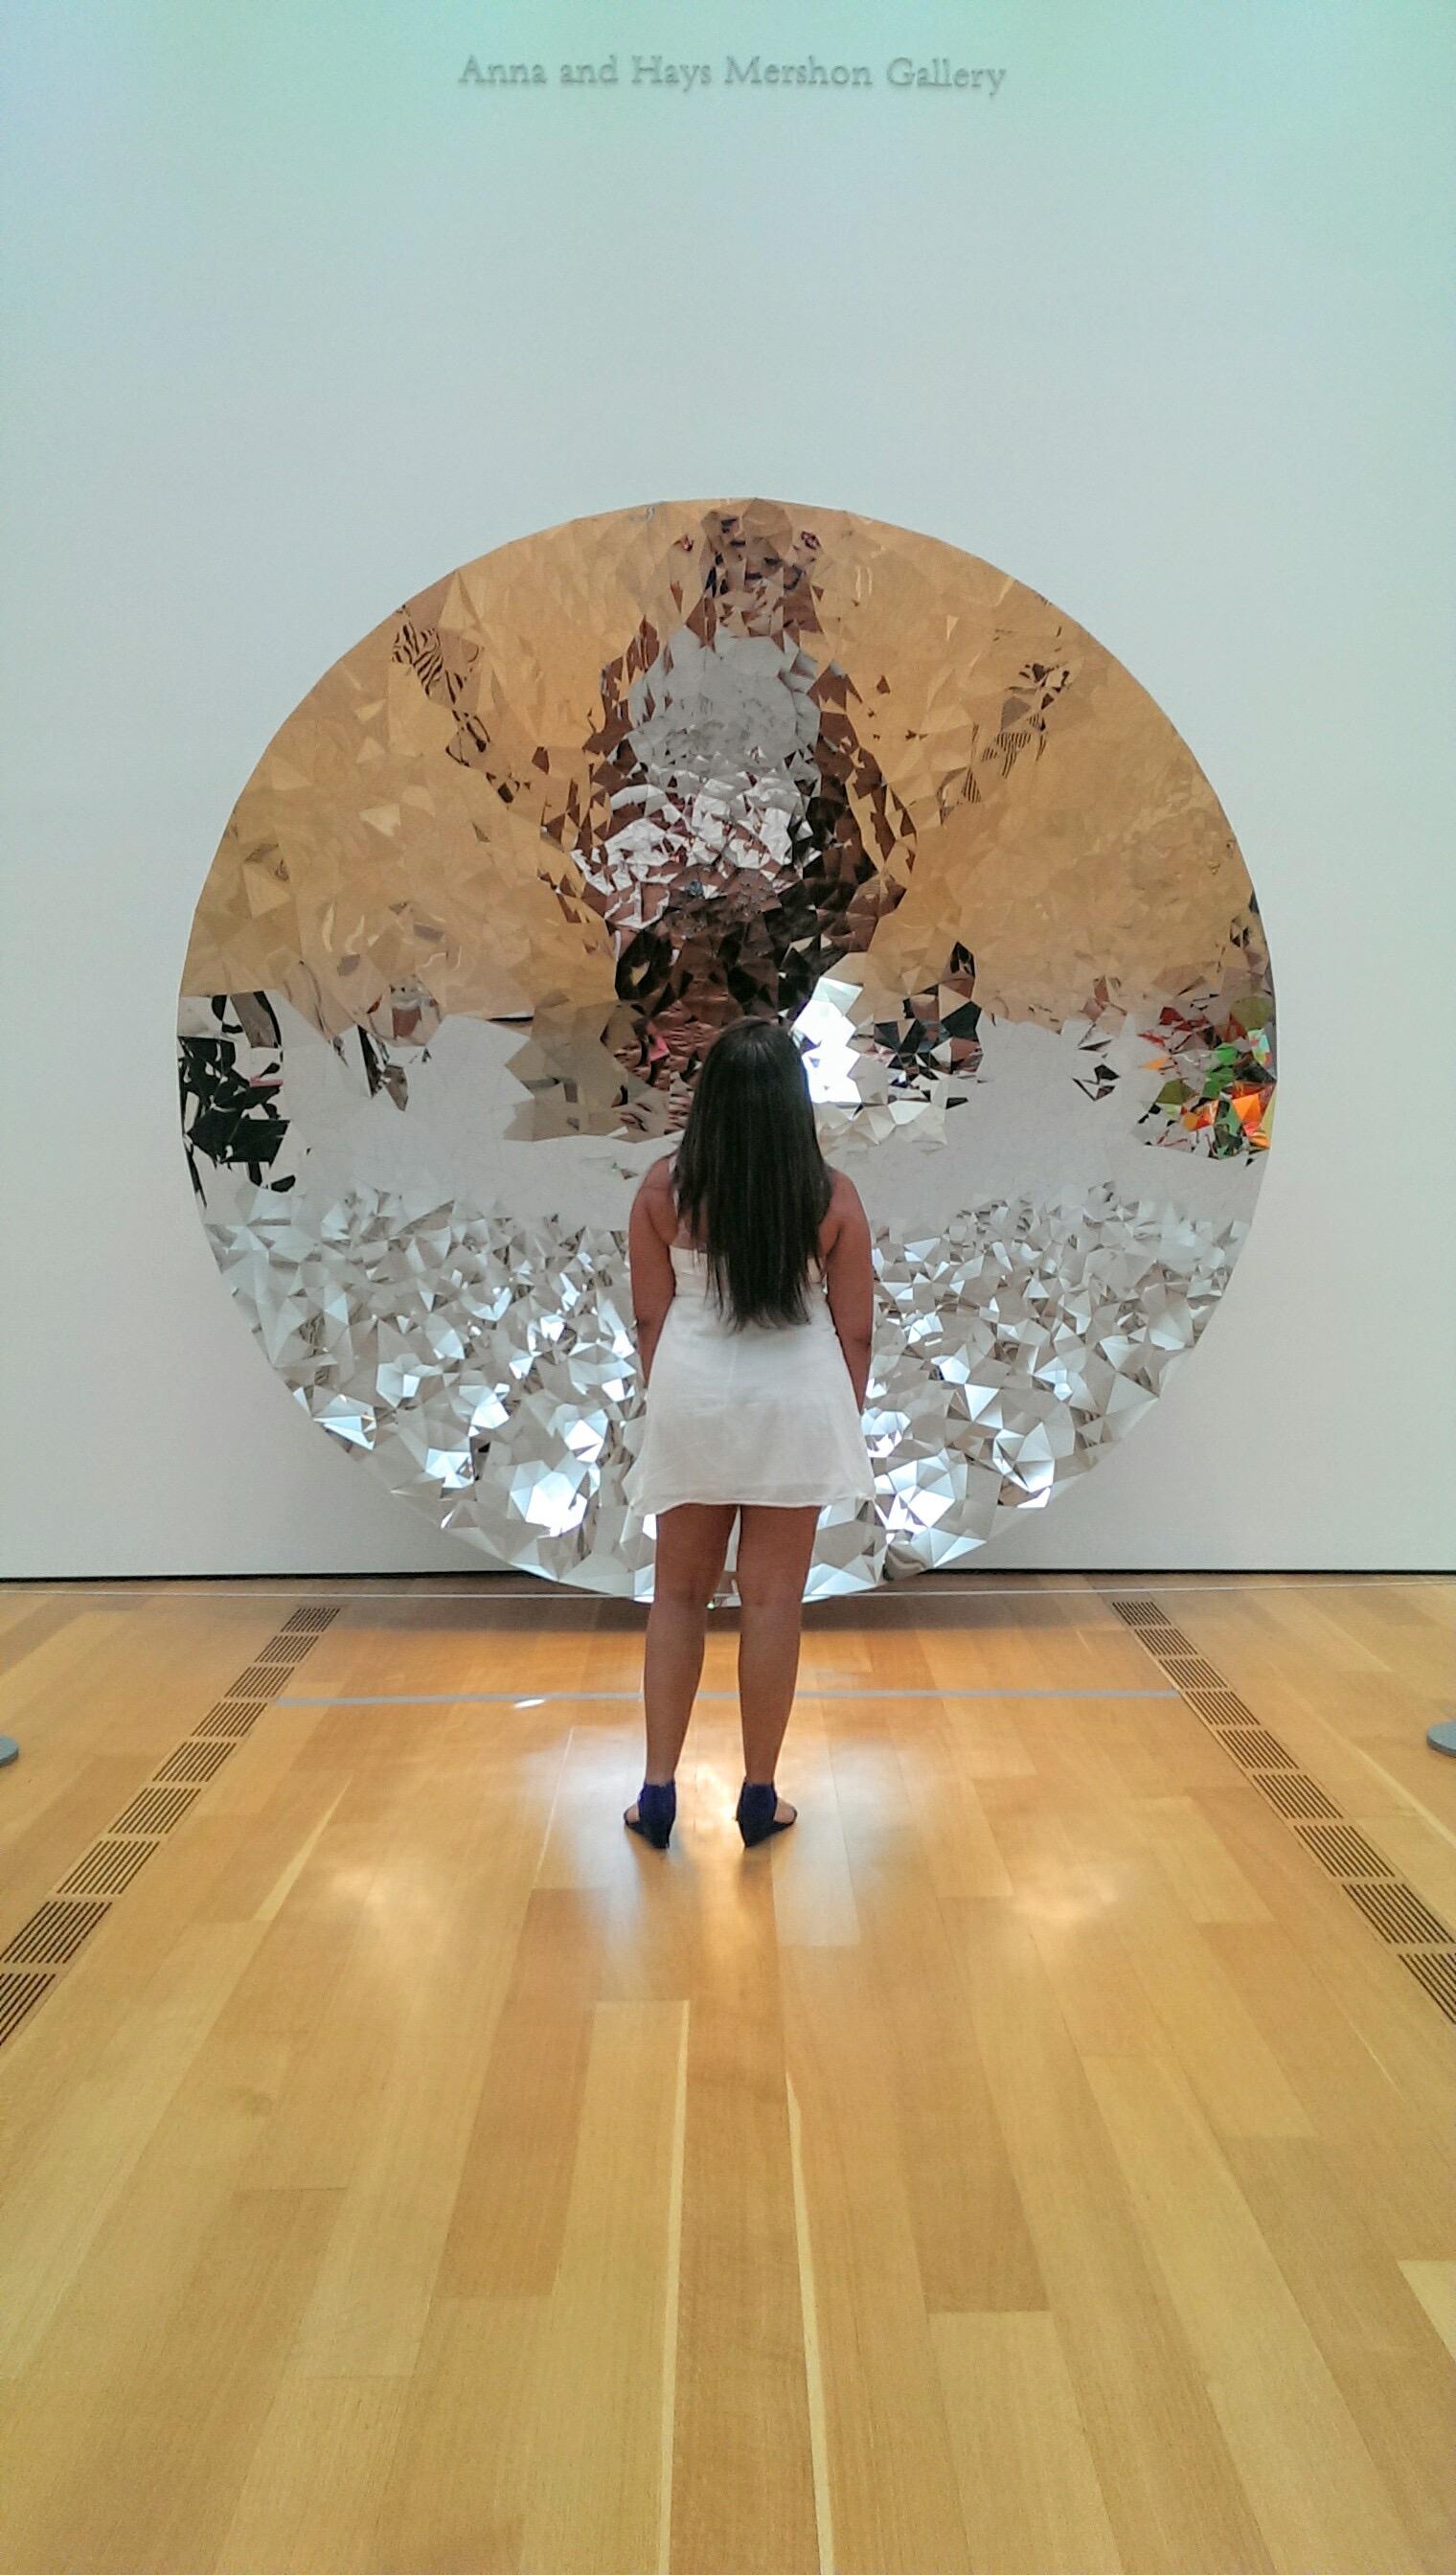 High Museum of Art Anna Hays Mershon Gallery, mirrored disk